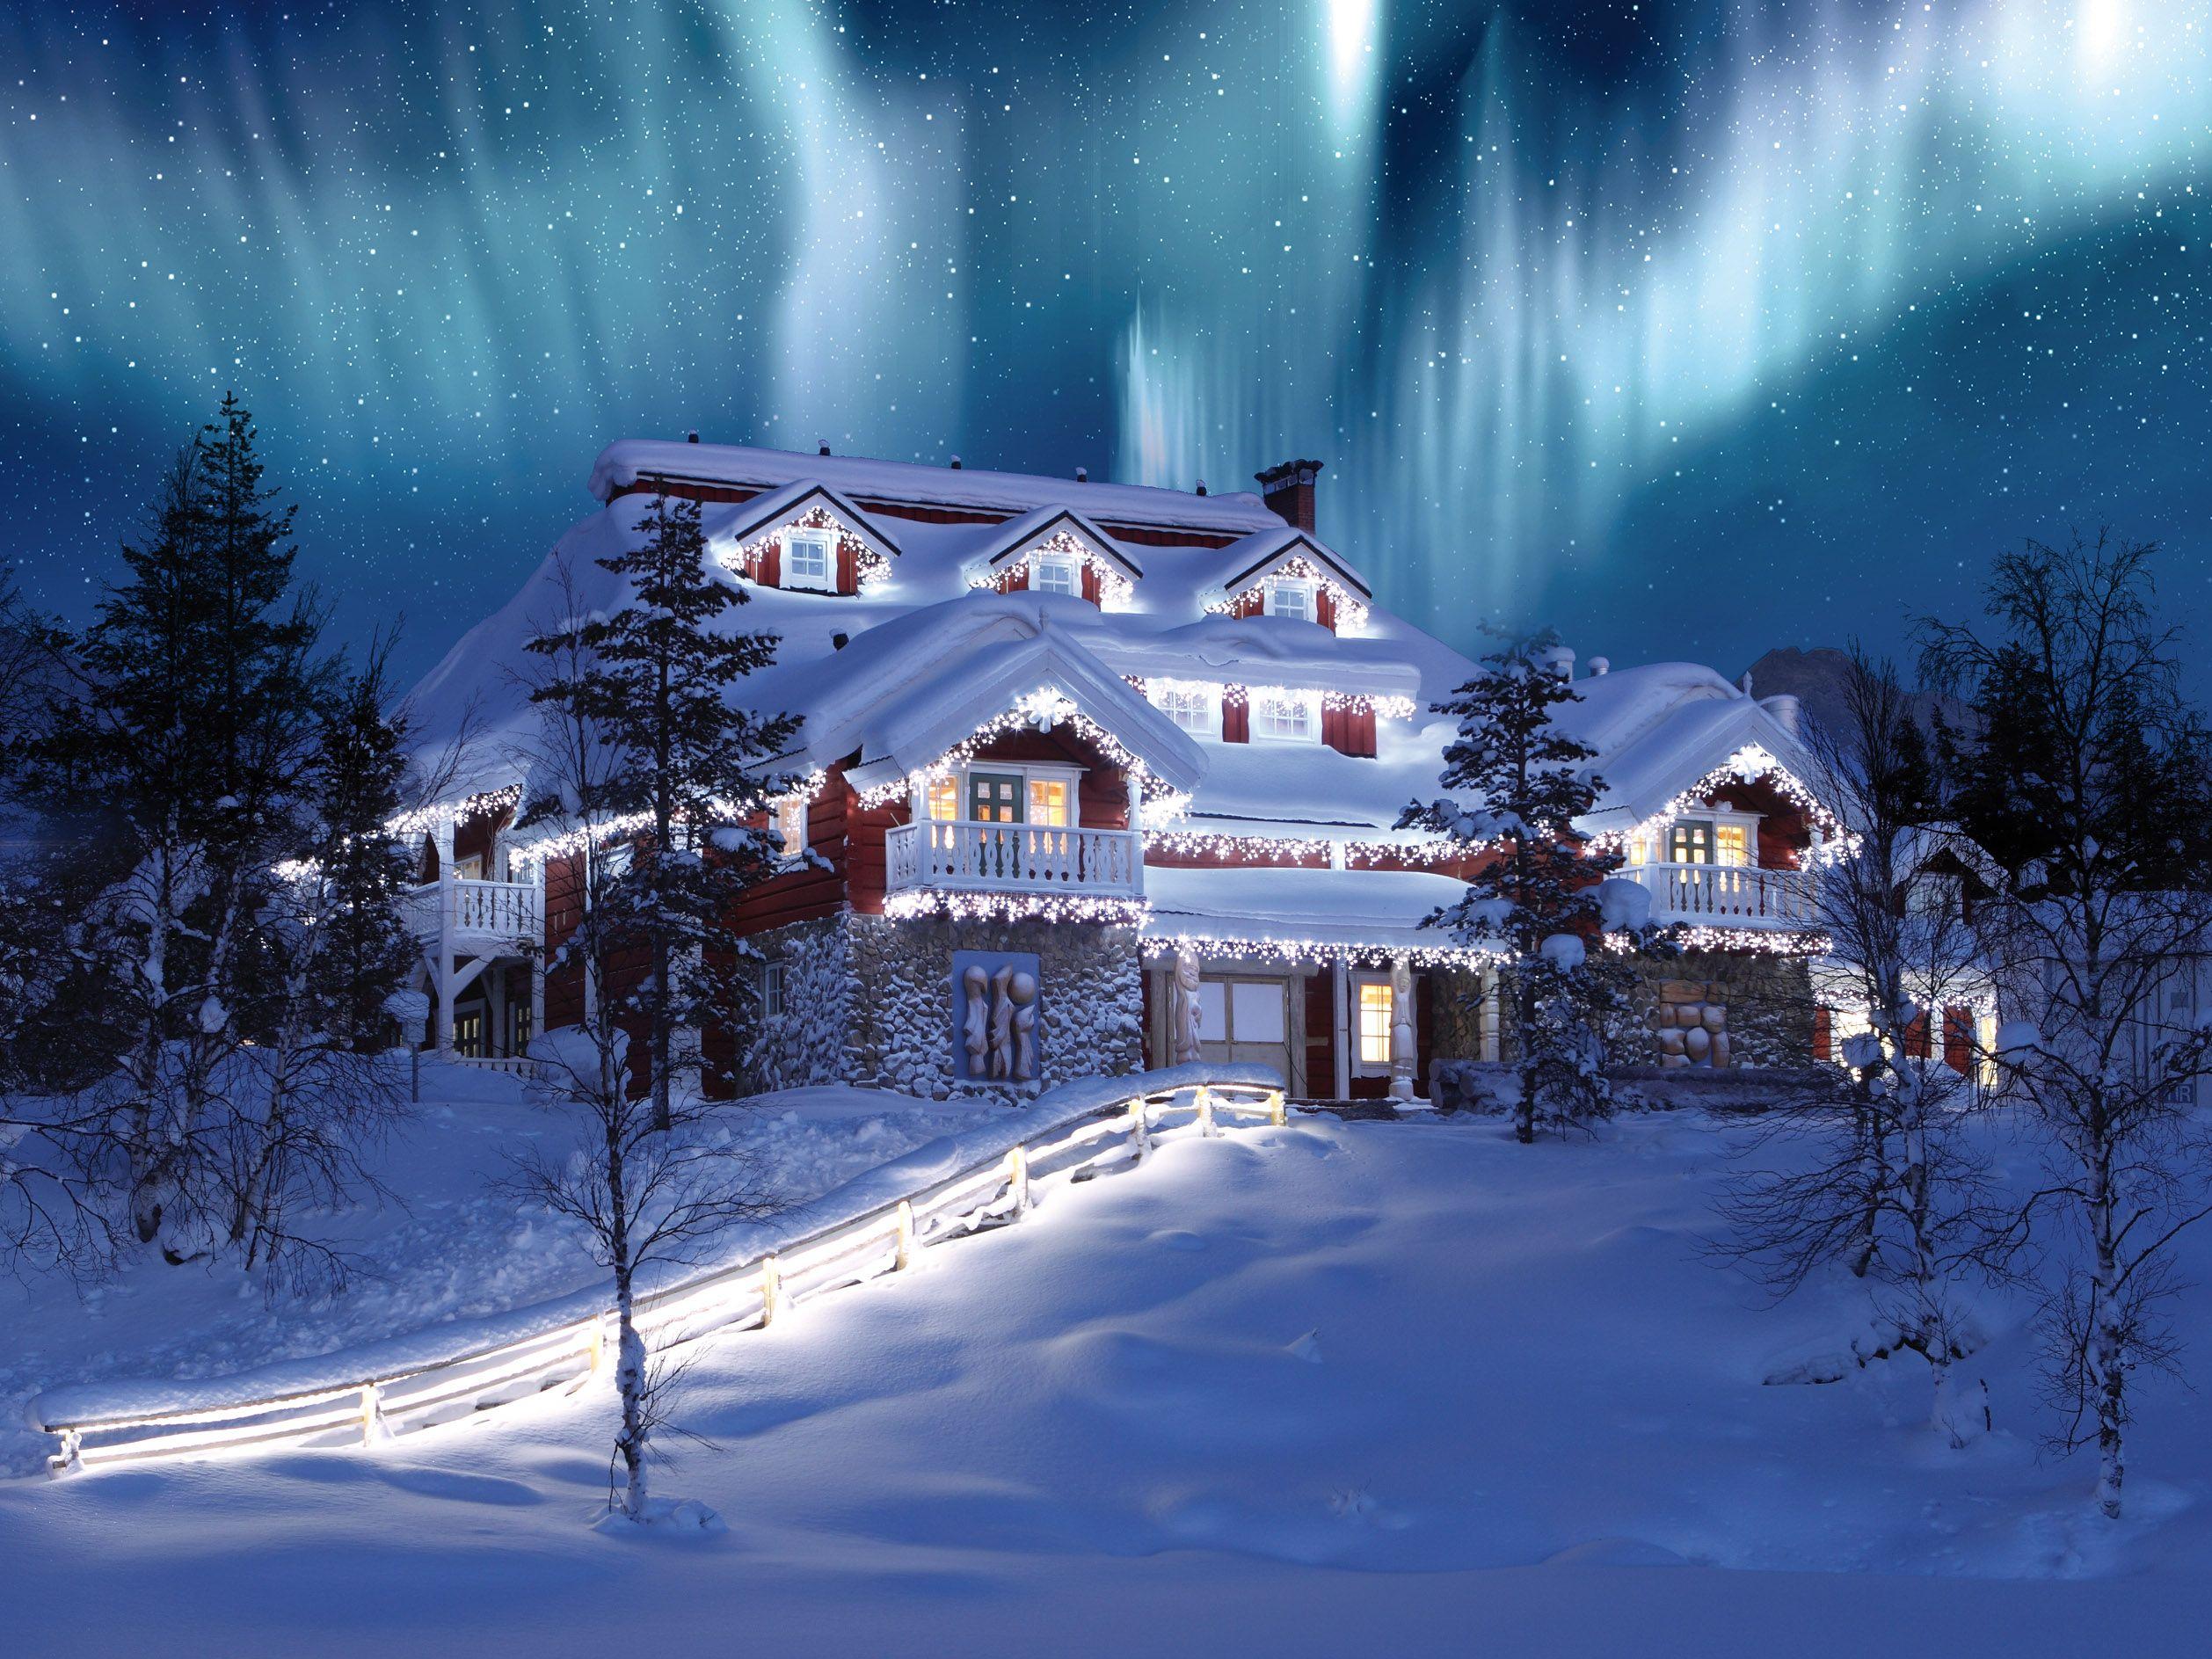 Holiday Christmas House Mansion Light Tree Sky Aurora Borealis Starry Sky Stars 2516x1887